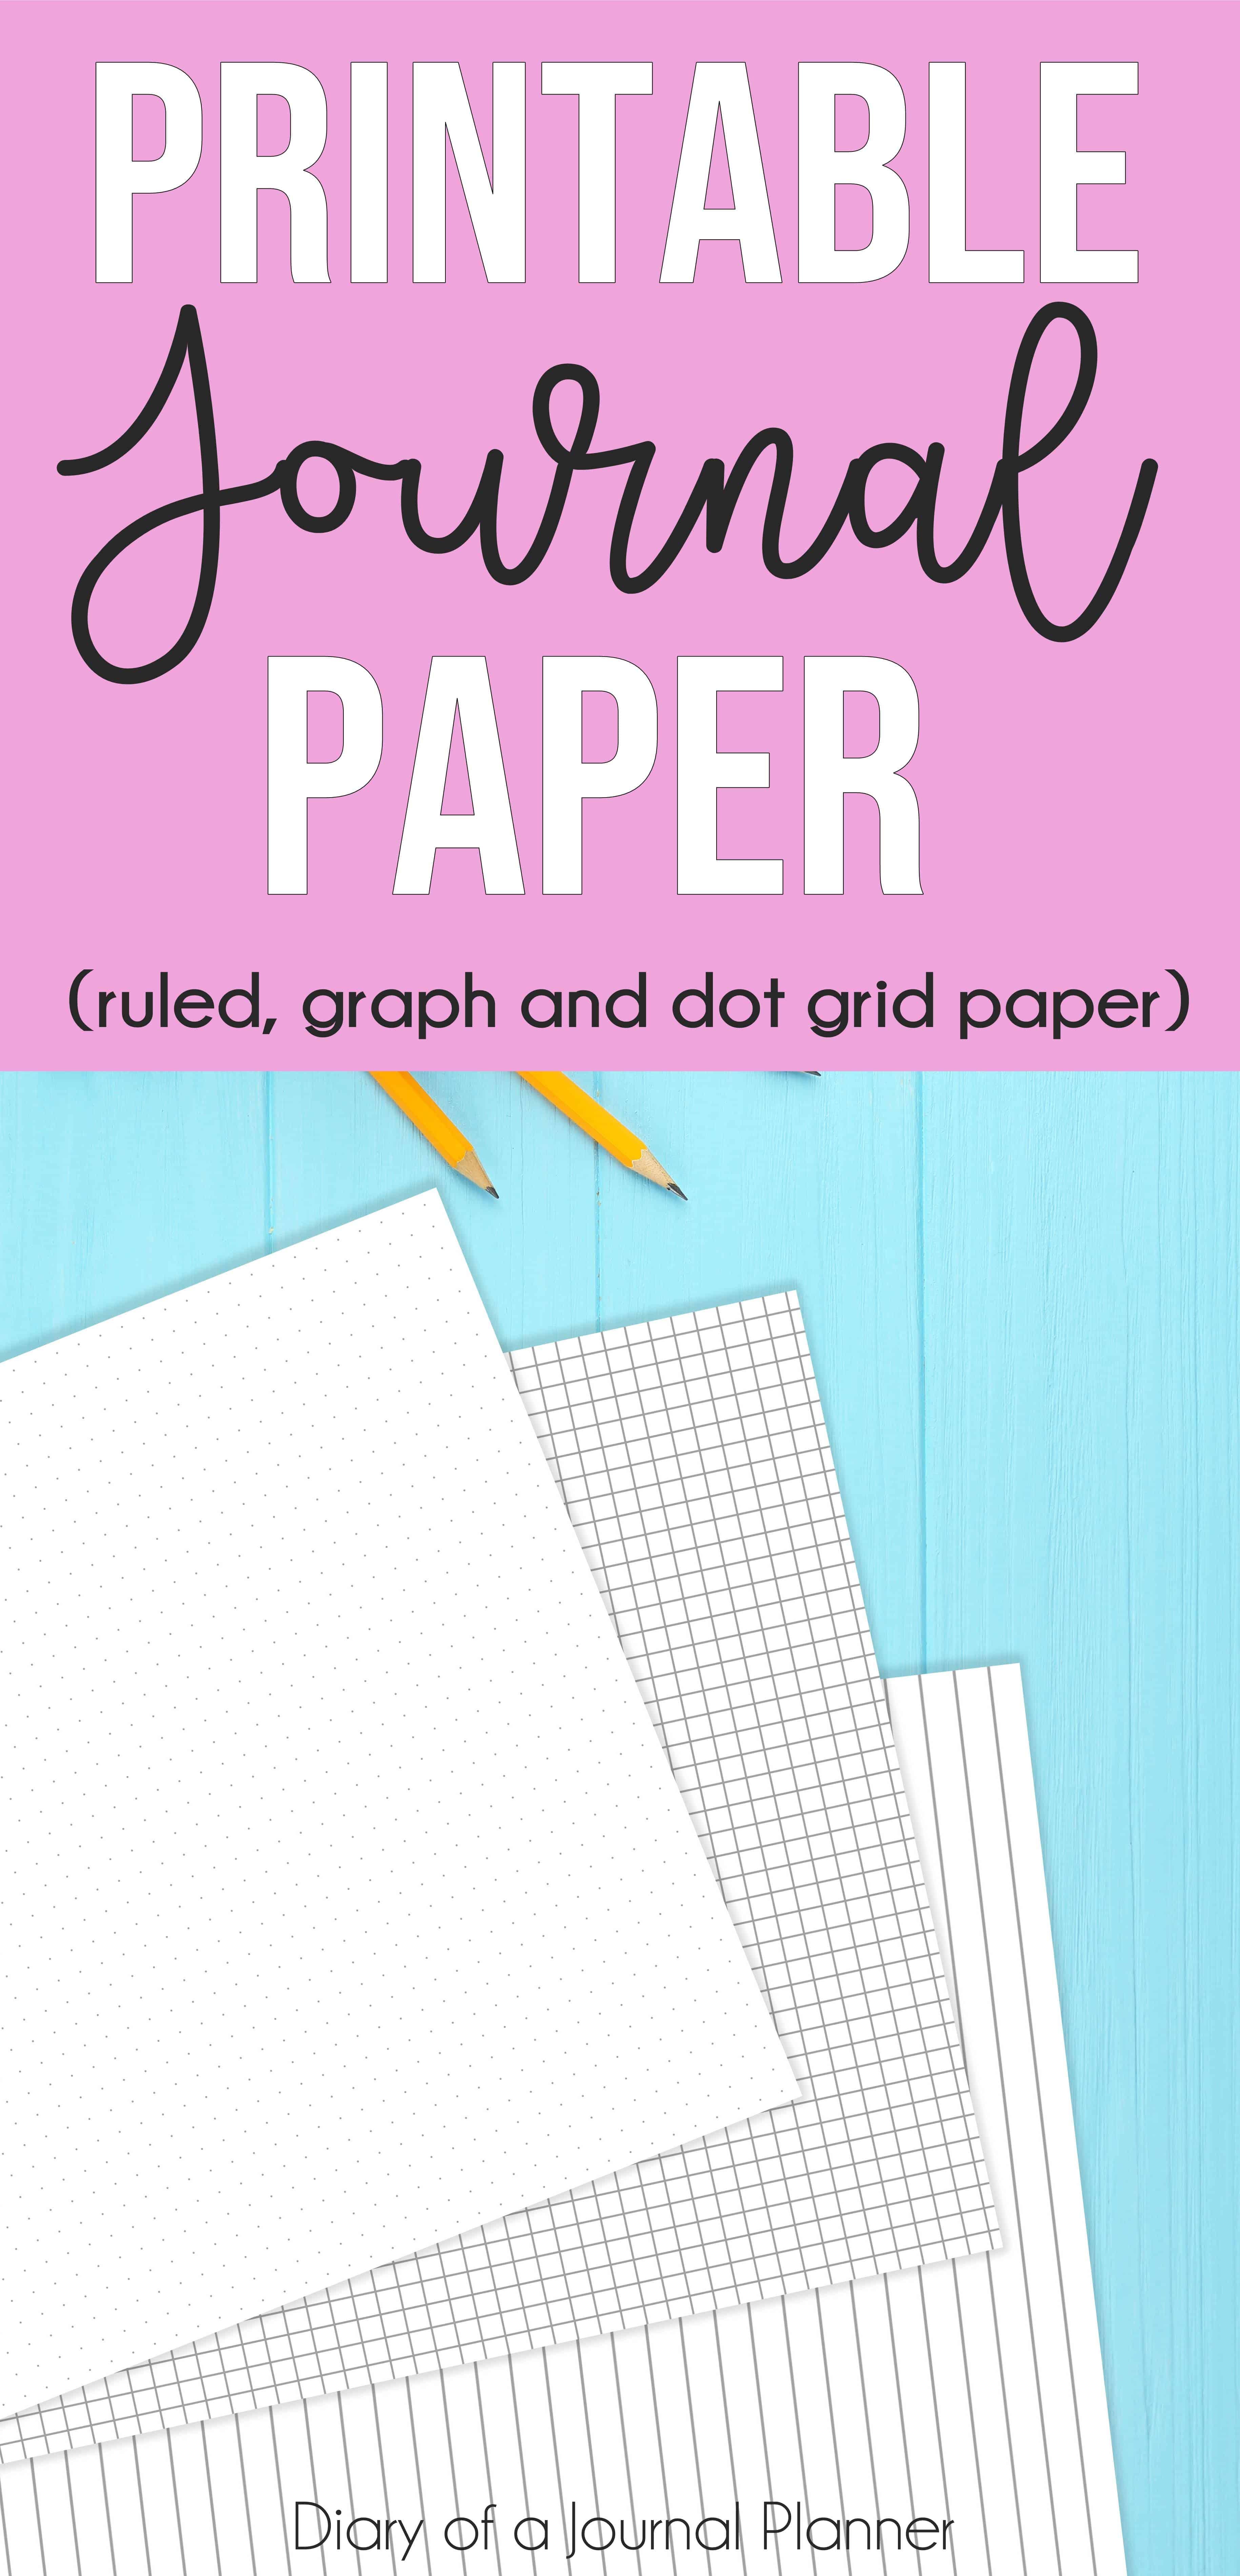 Free printable Journal paper